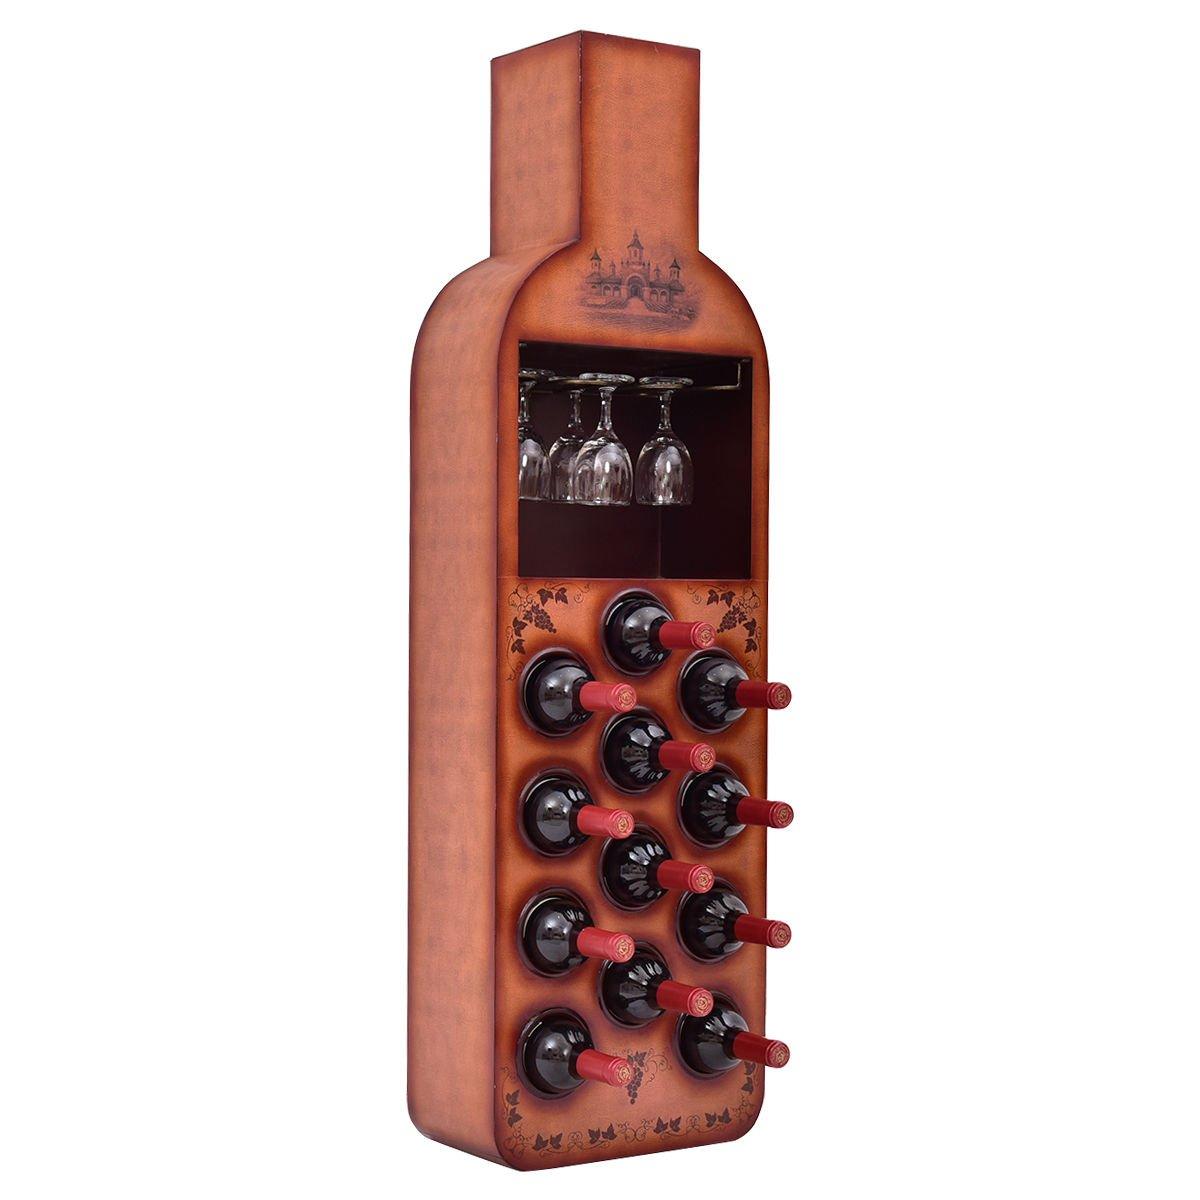 Giantex 12 Bottles Bottle Shaped Wine Rack Cabinet Wood Storage Bar Stand Liquor Shelf HW54837